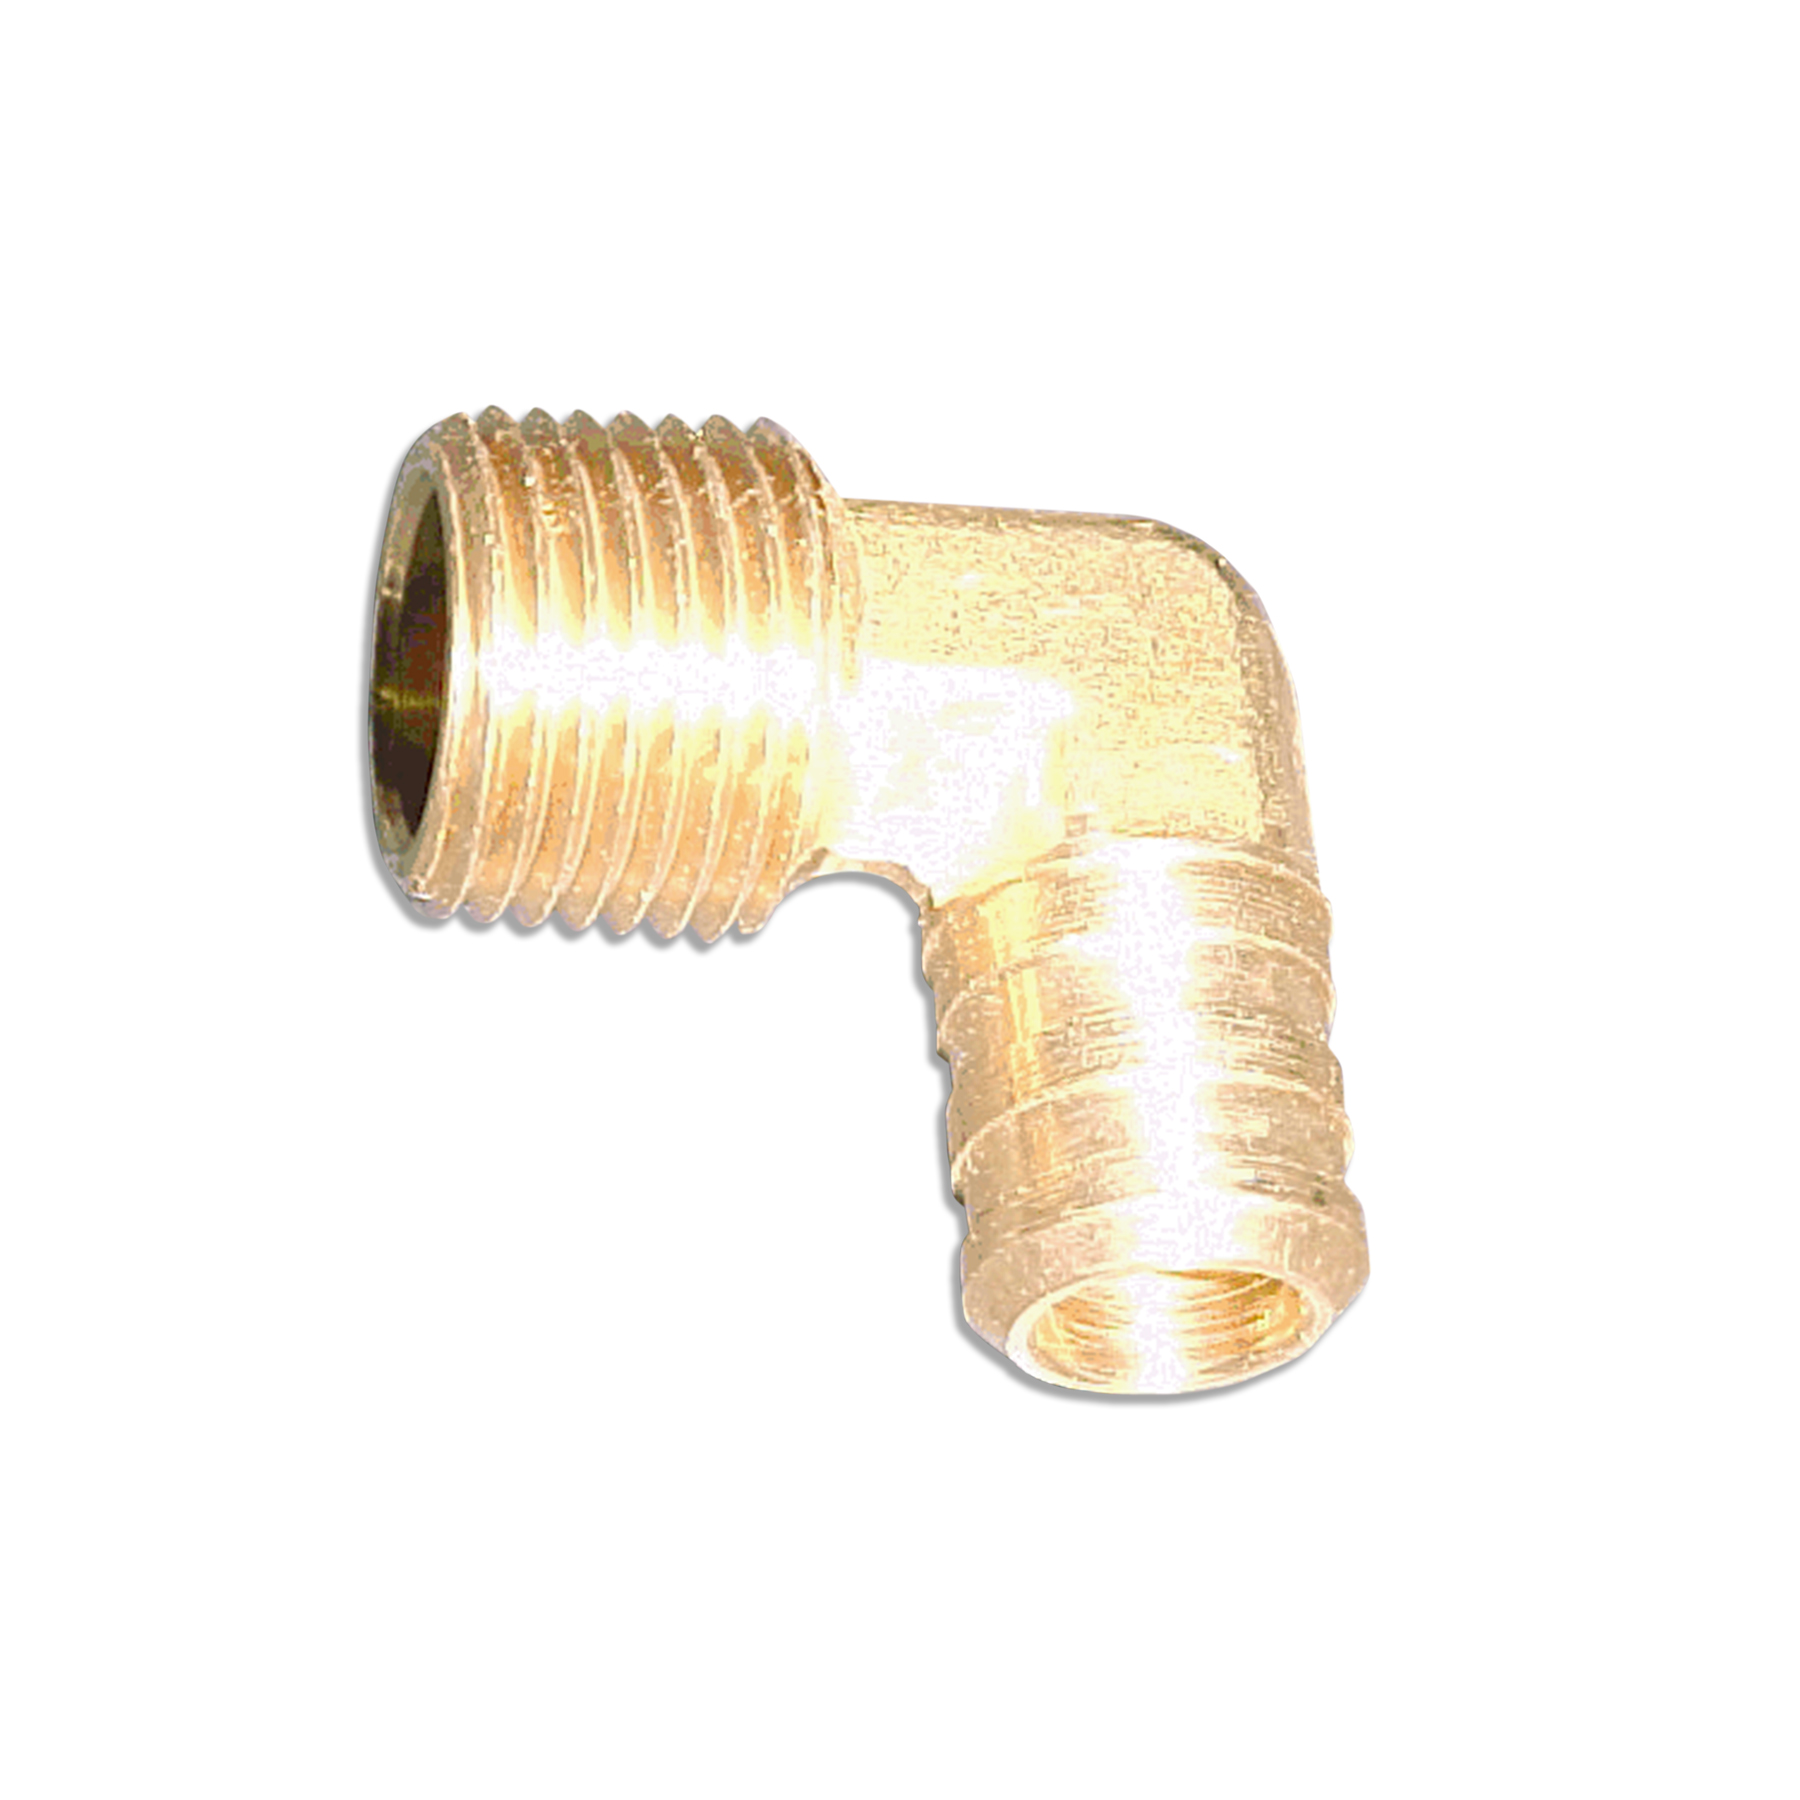 Brass Elbow Fitting, 1/2 NPT x 5/8